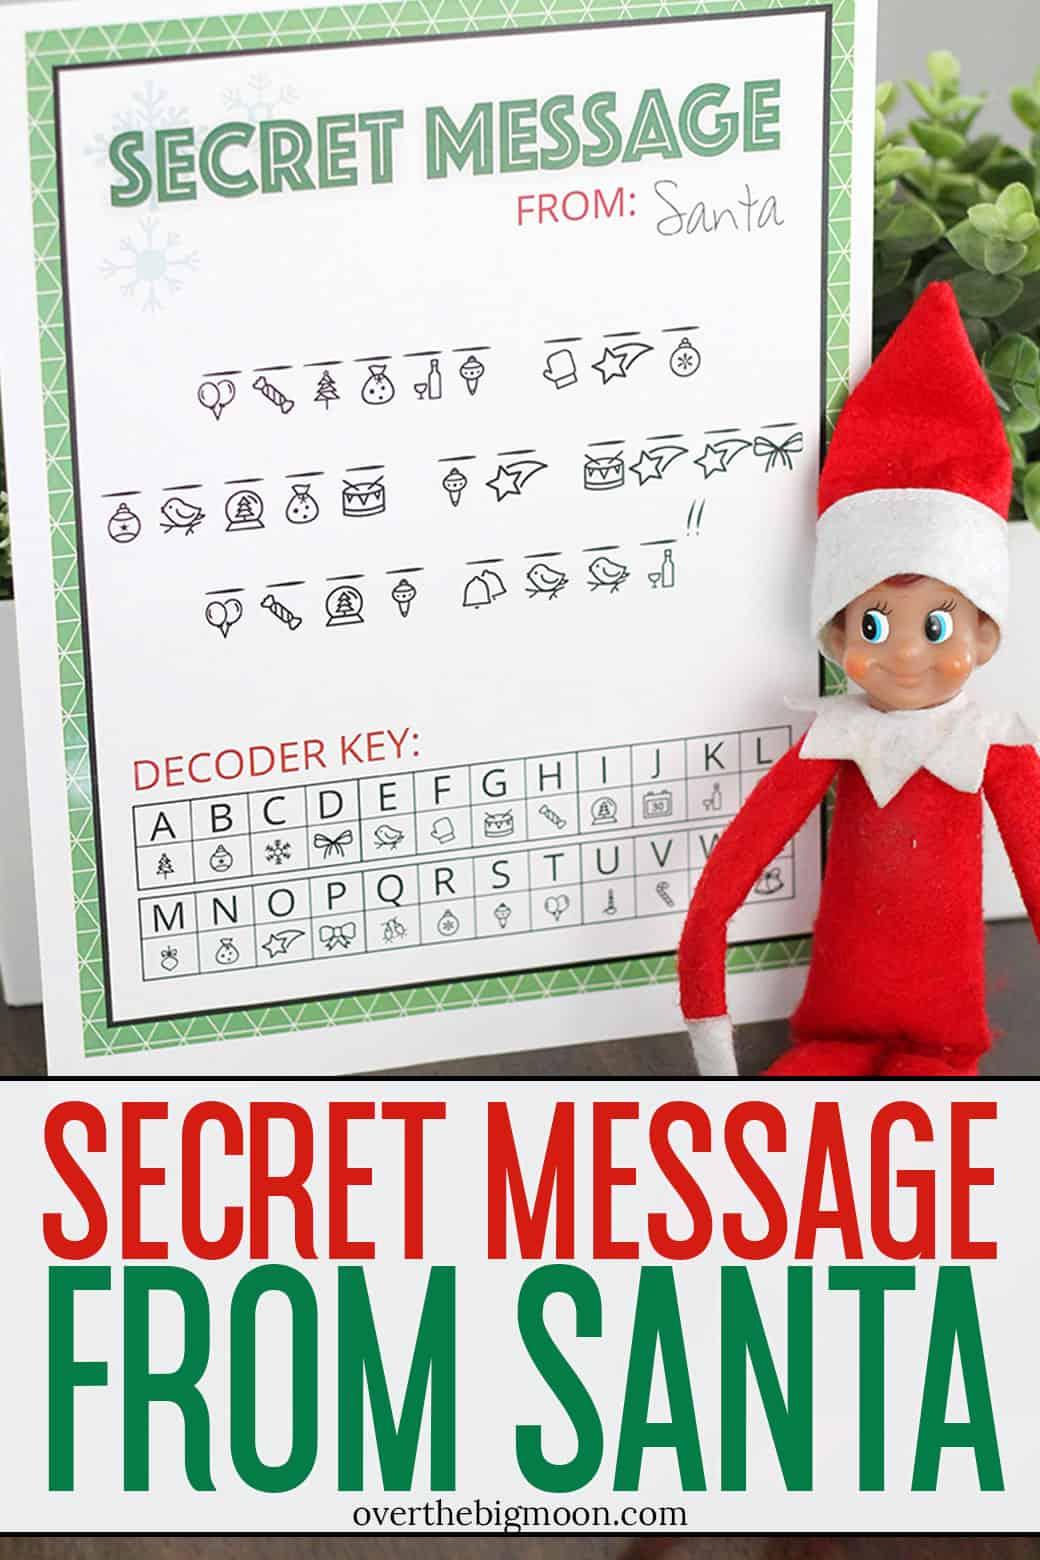 Secret Message From Santa Printable